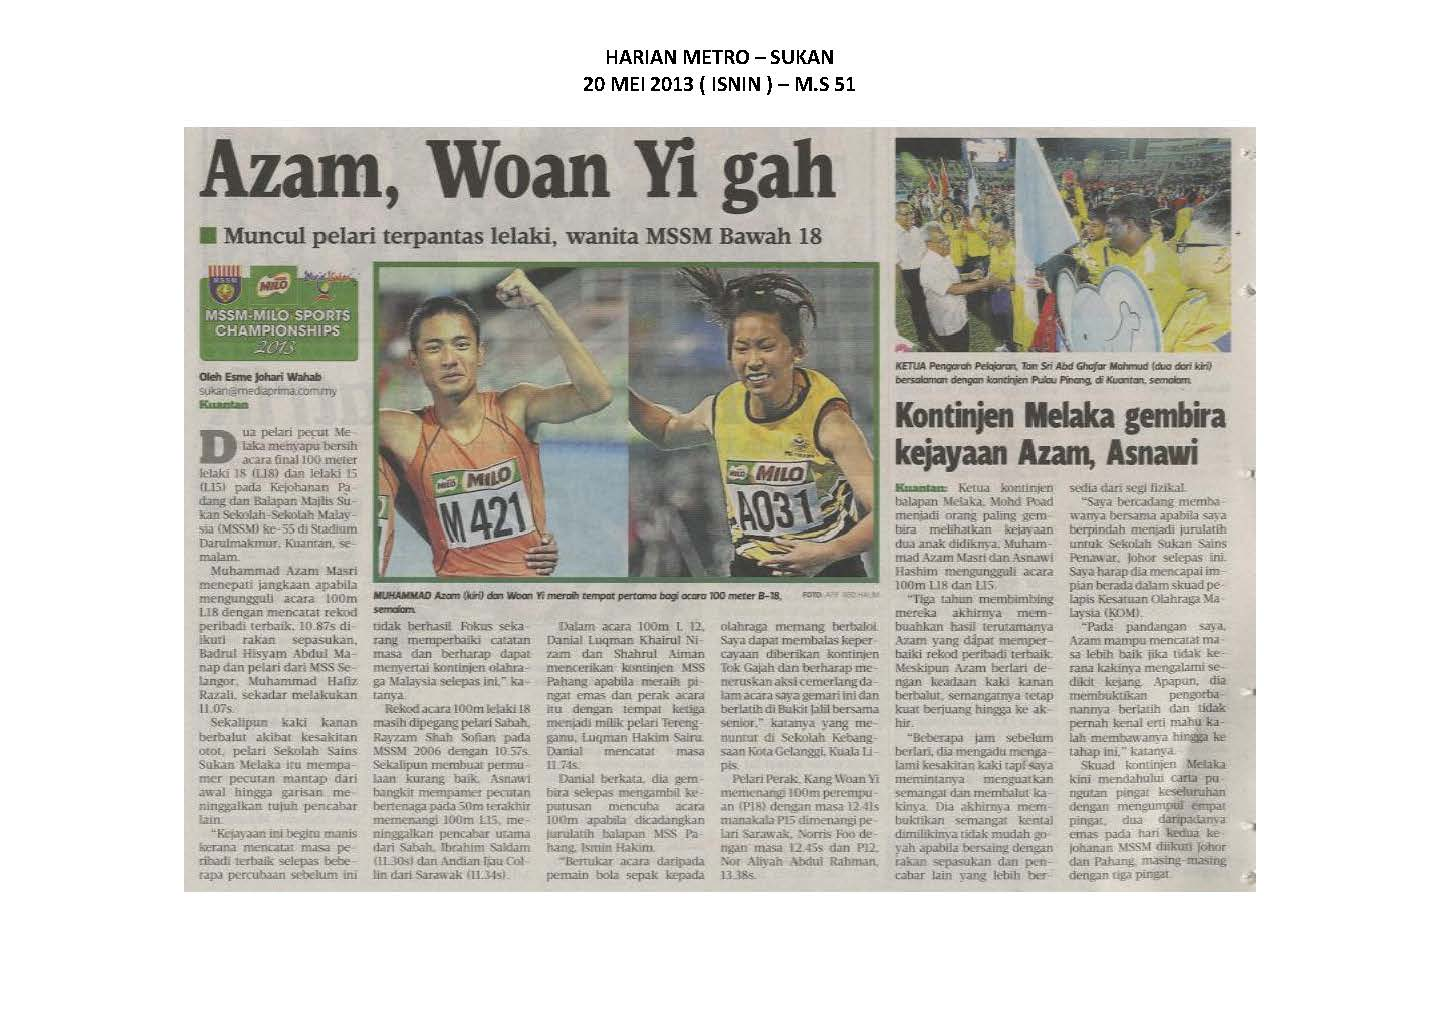 20.05.2013 - MSSM-MILO SPORTS CHAMPIONSHIPS 2013 - Harian Metro